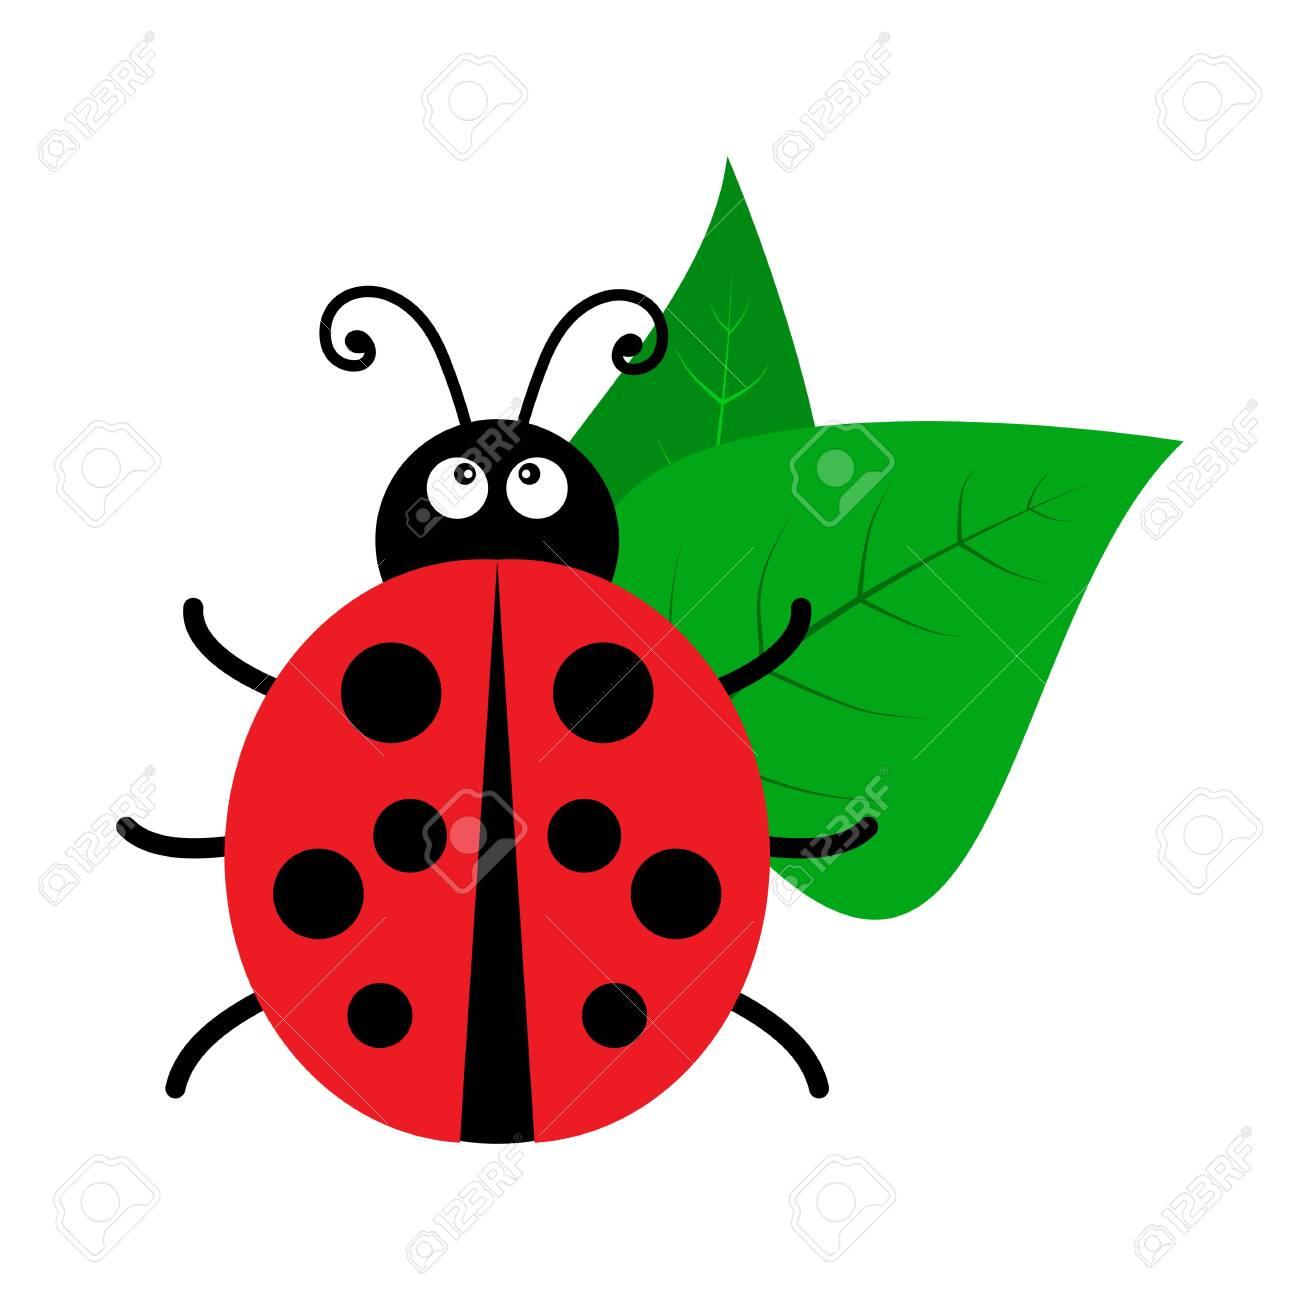 Bright ladybug icon. Vector illustration - 128941833